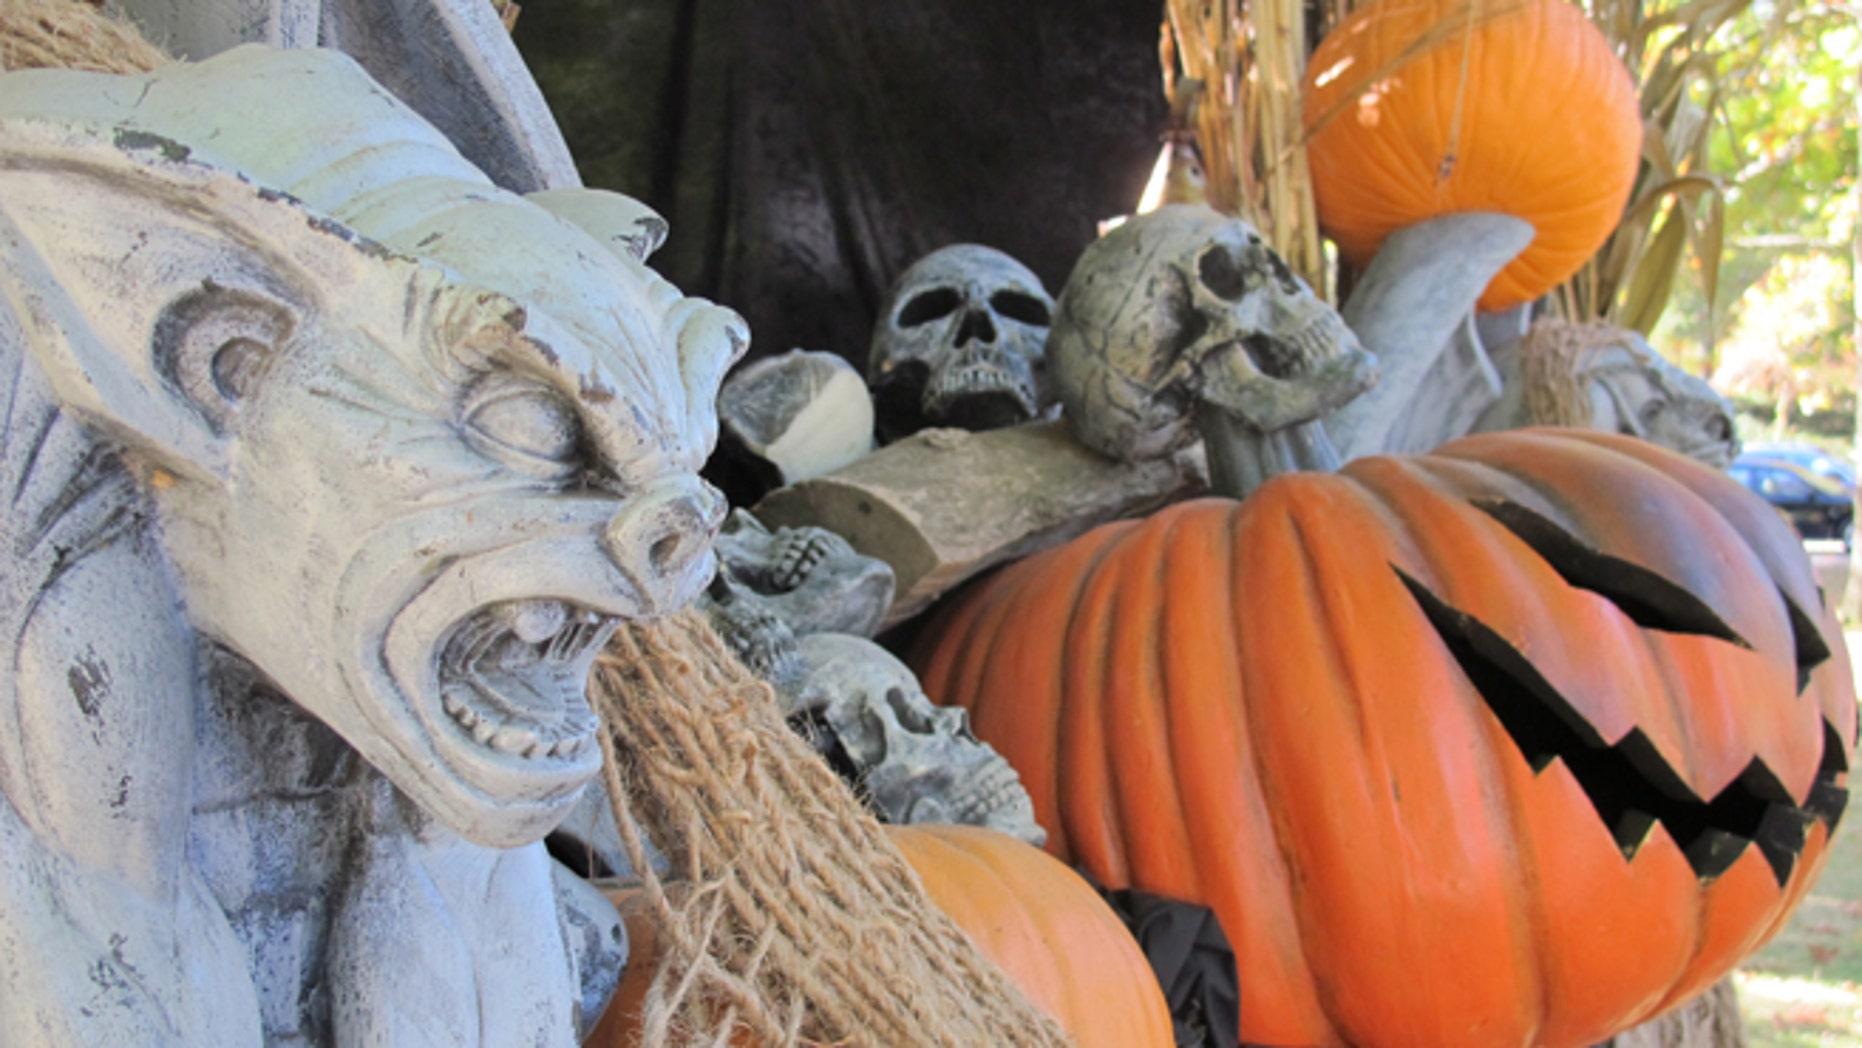 A Halloween display greets visitors to Philipsburg Manor in Sleepy Hollow, N.Y.